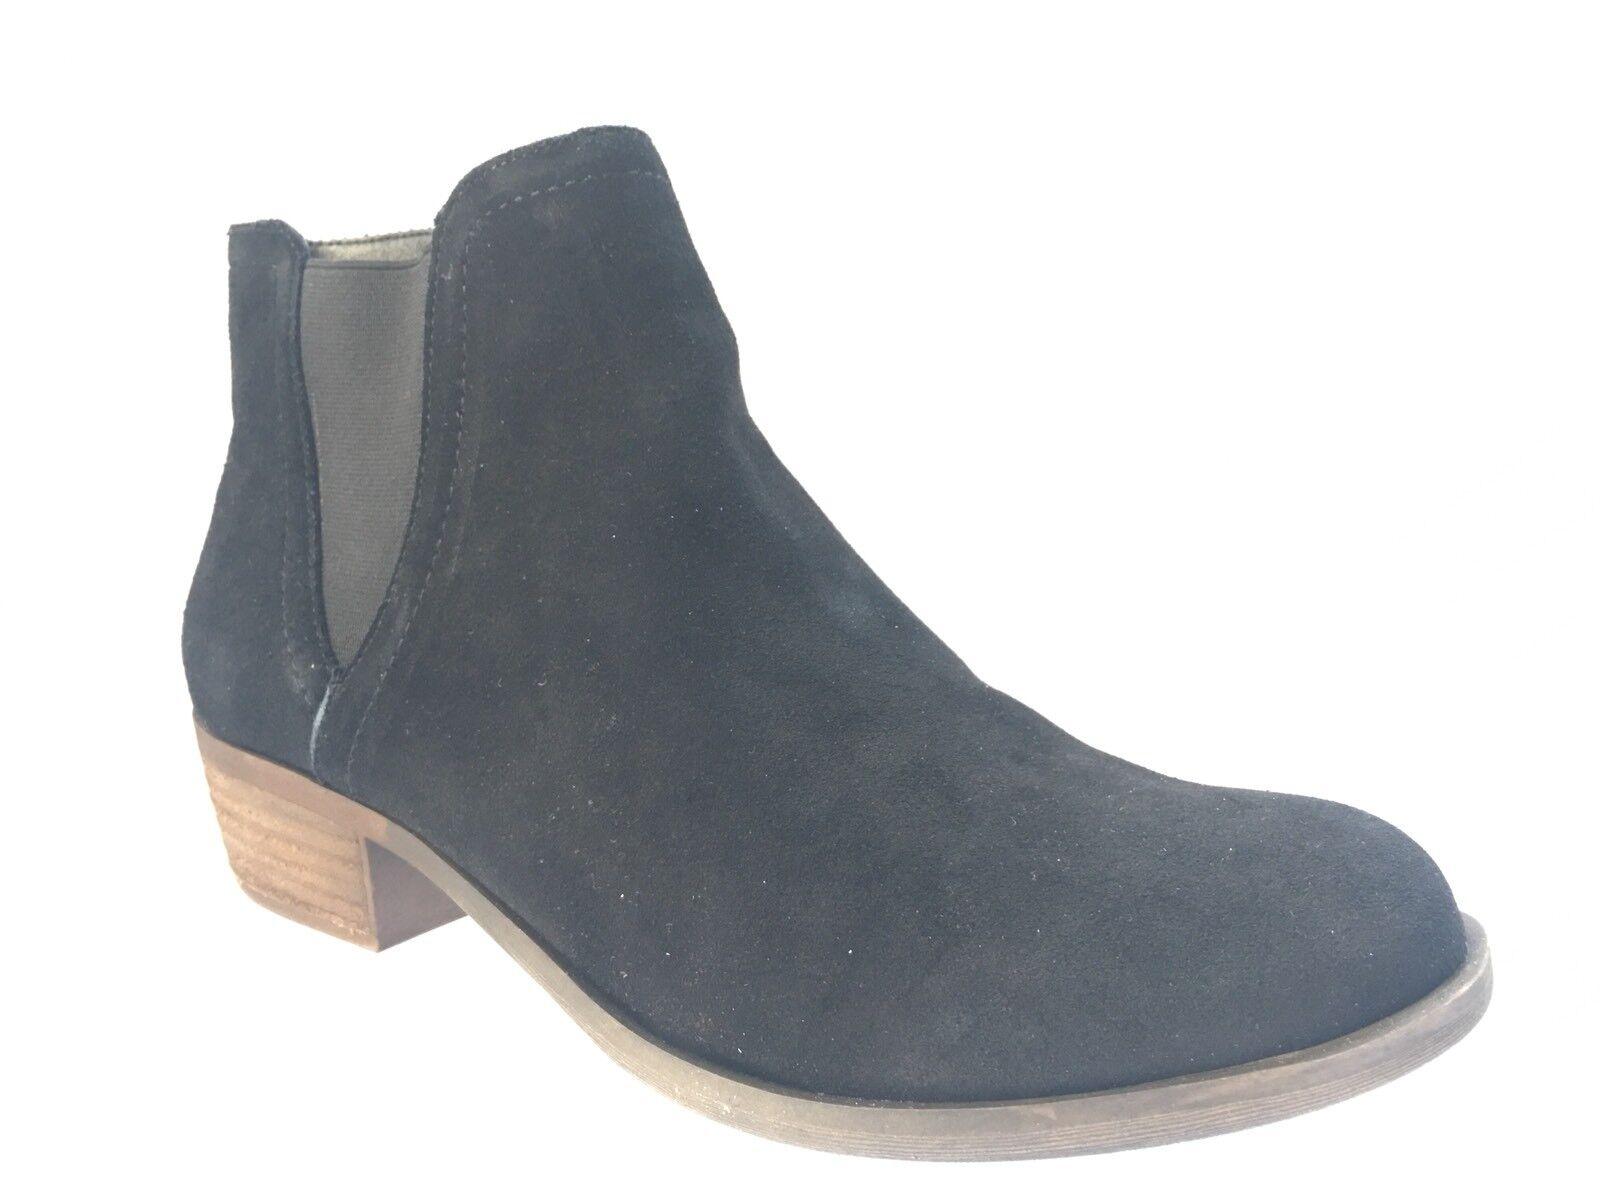 Kensie Garrett al tobillo Botines Elegante Zapatos Negro Talla Talla Talla 10  toma